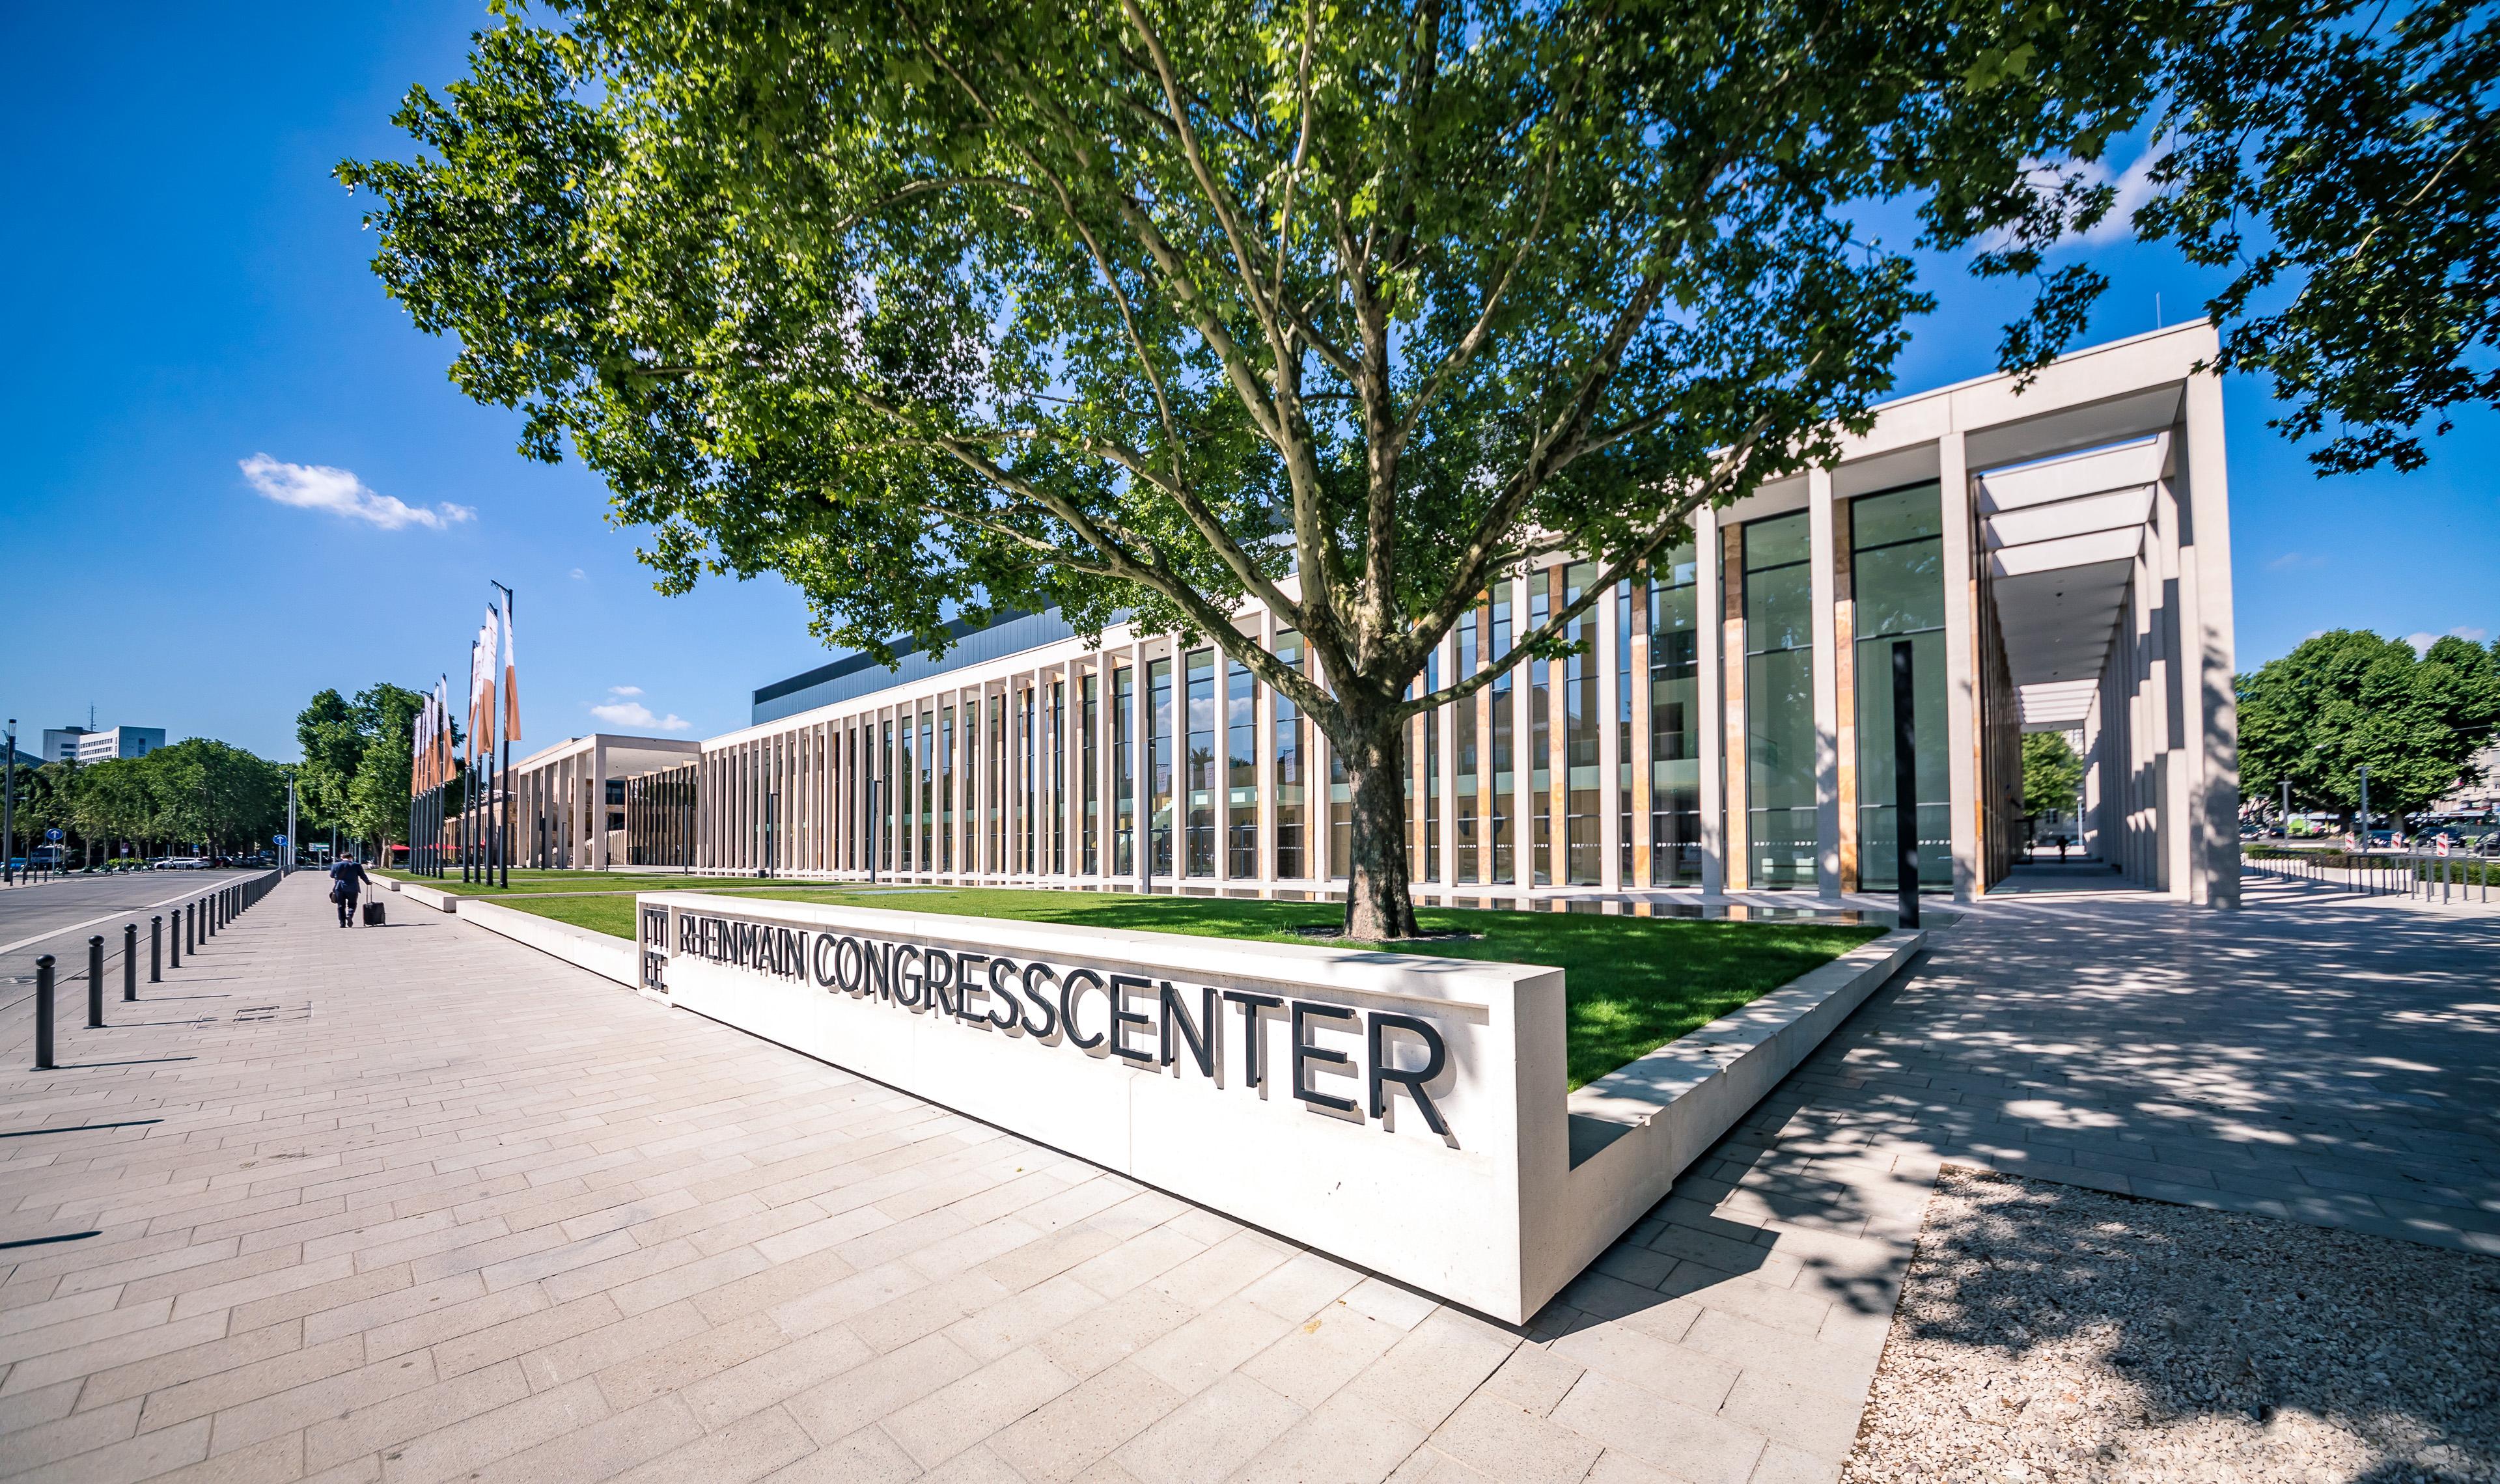 CC Wiesbaden